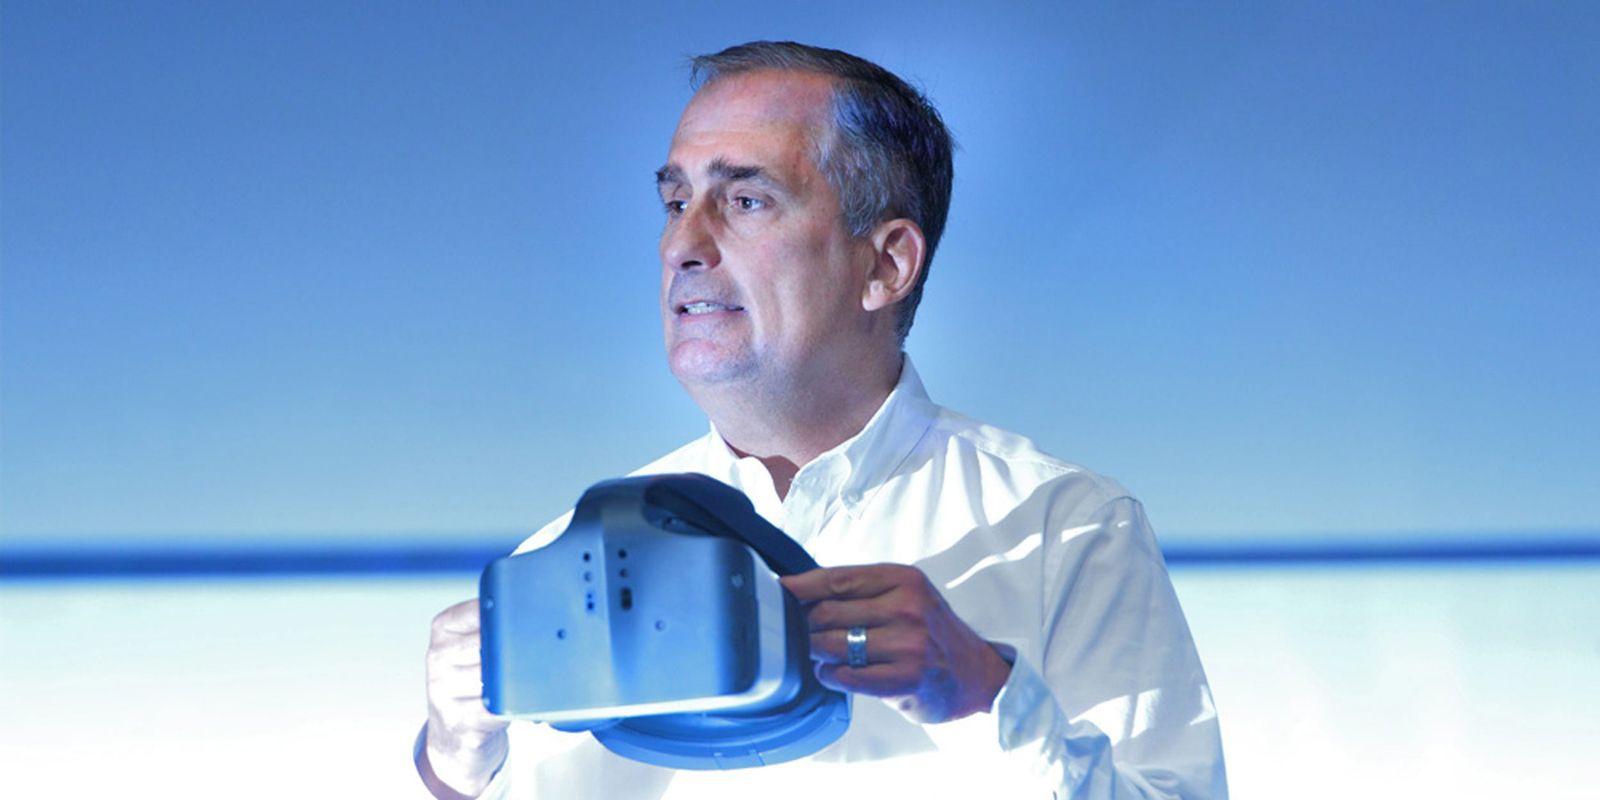 Intel presents virtual reality headset Project Alloy